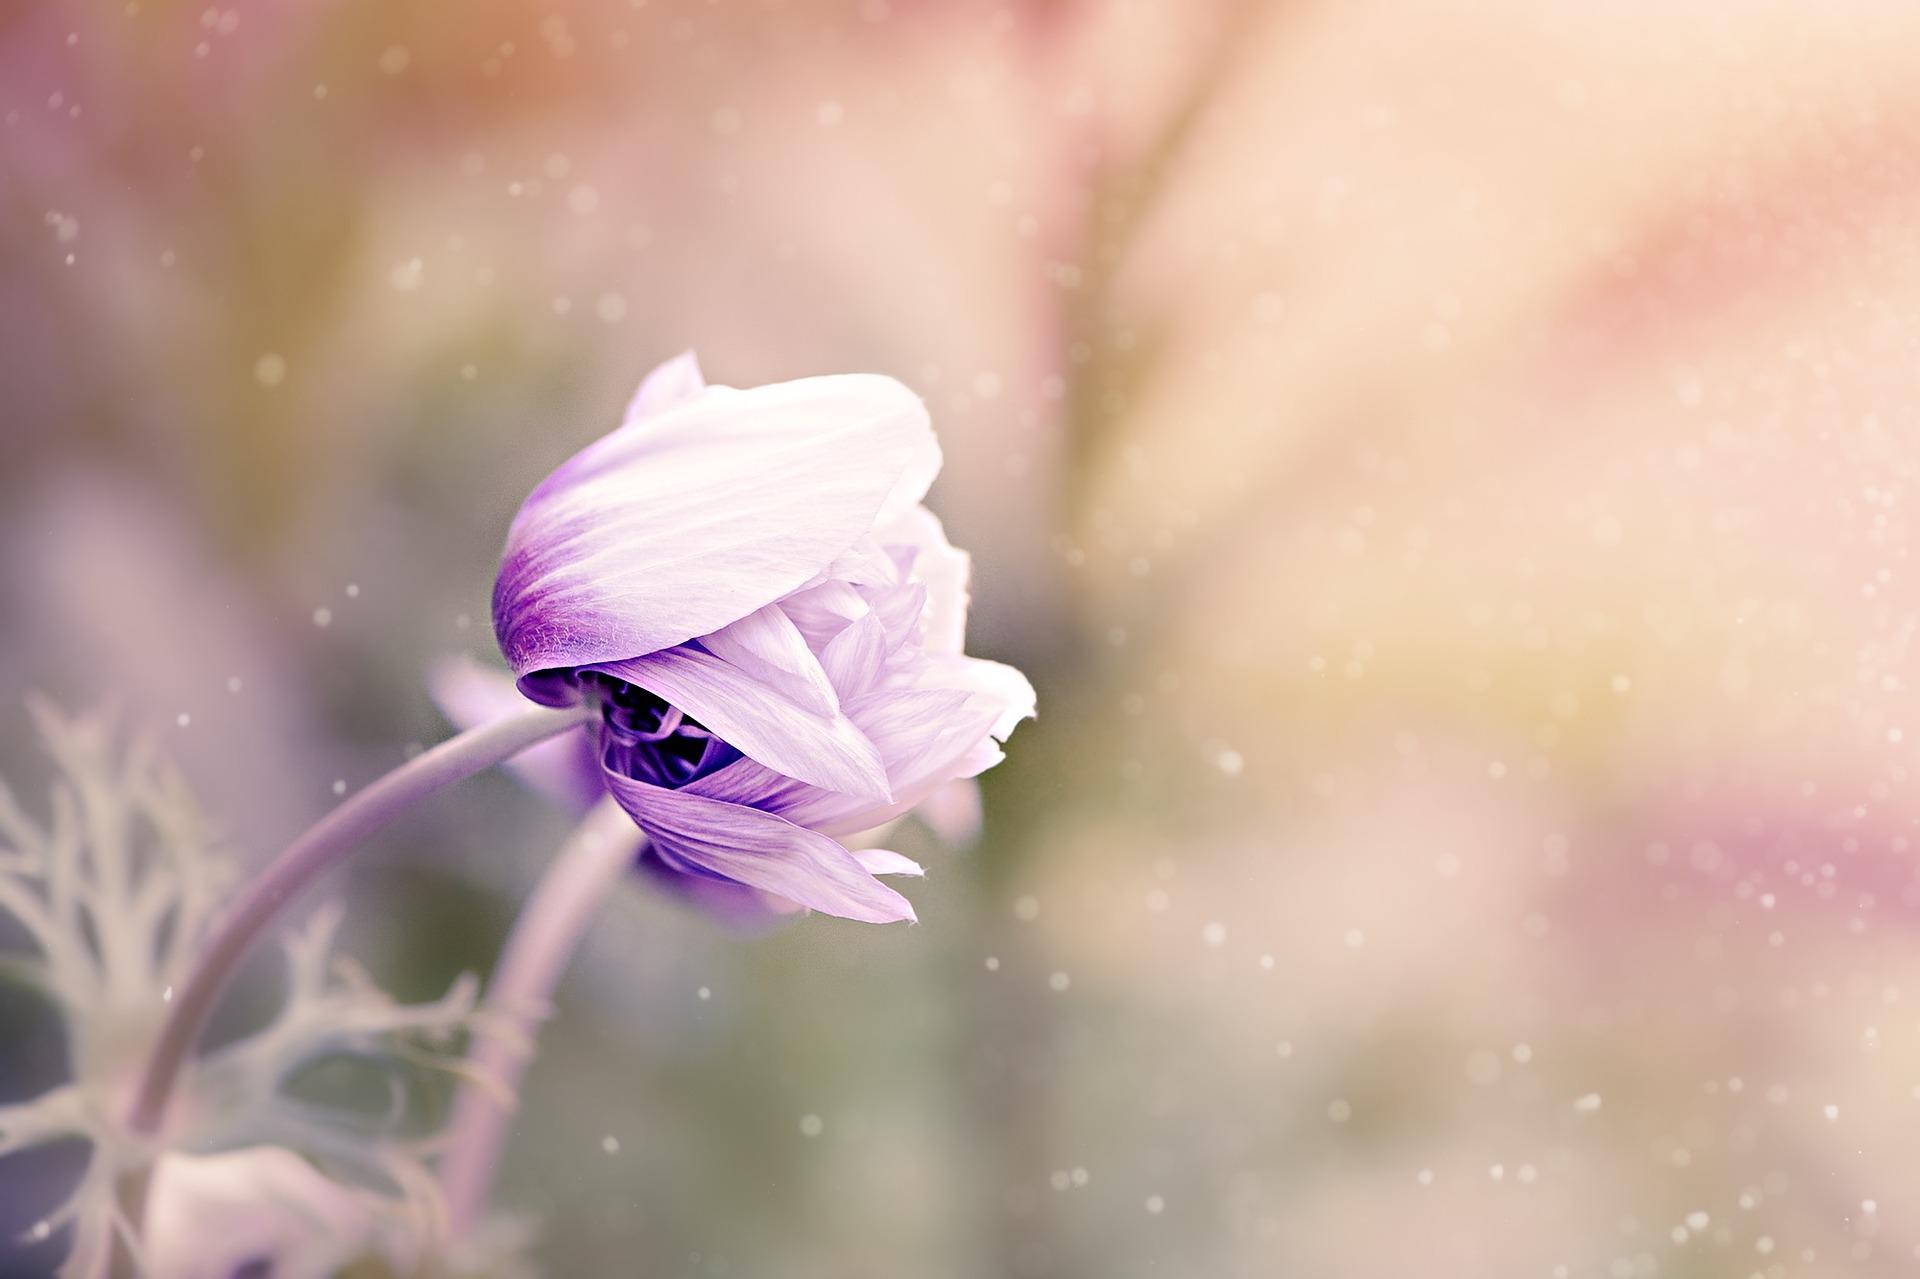 anemone-1533515_1920.jpg